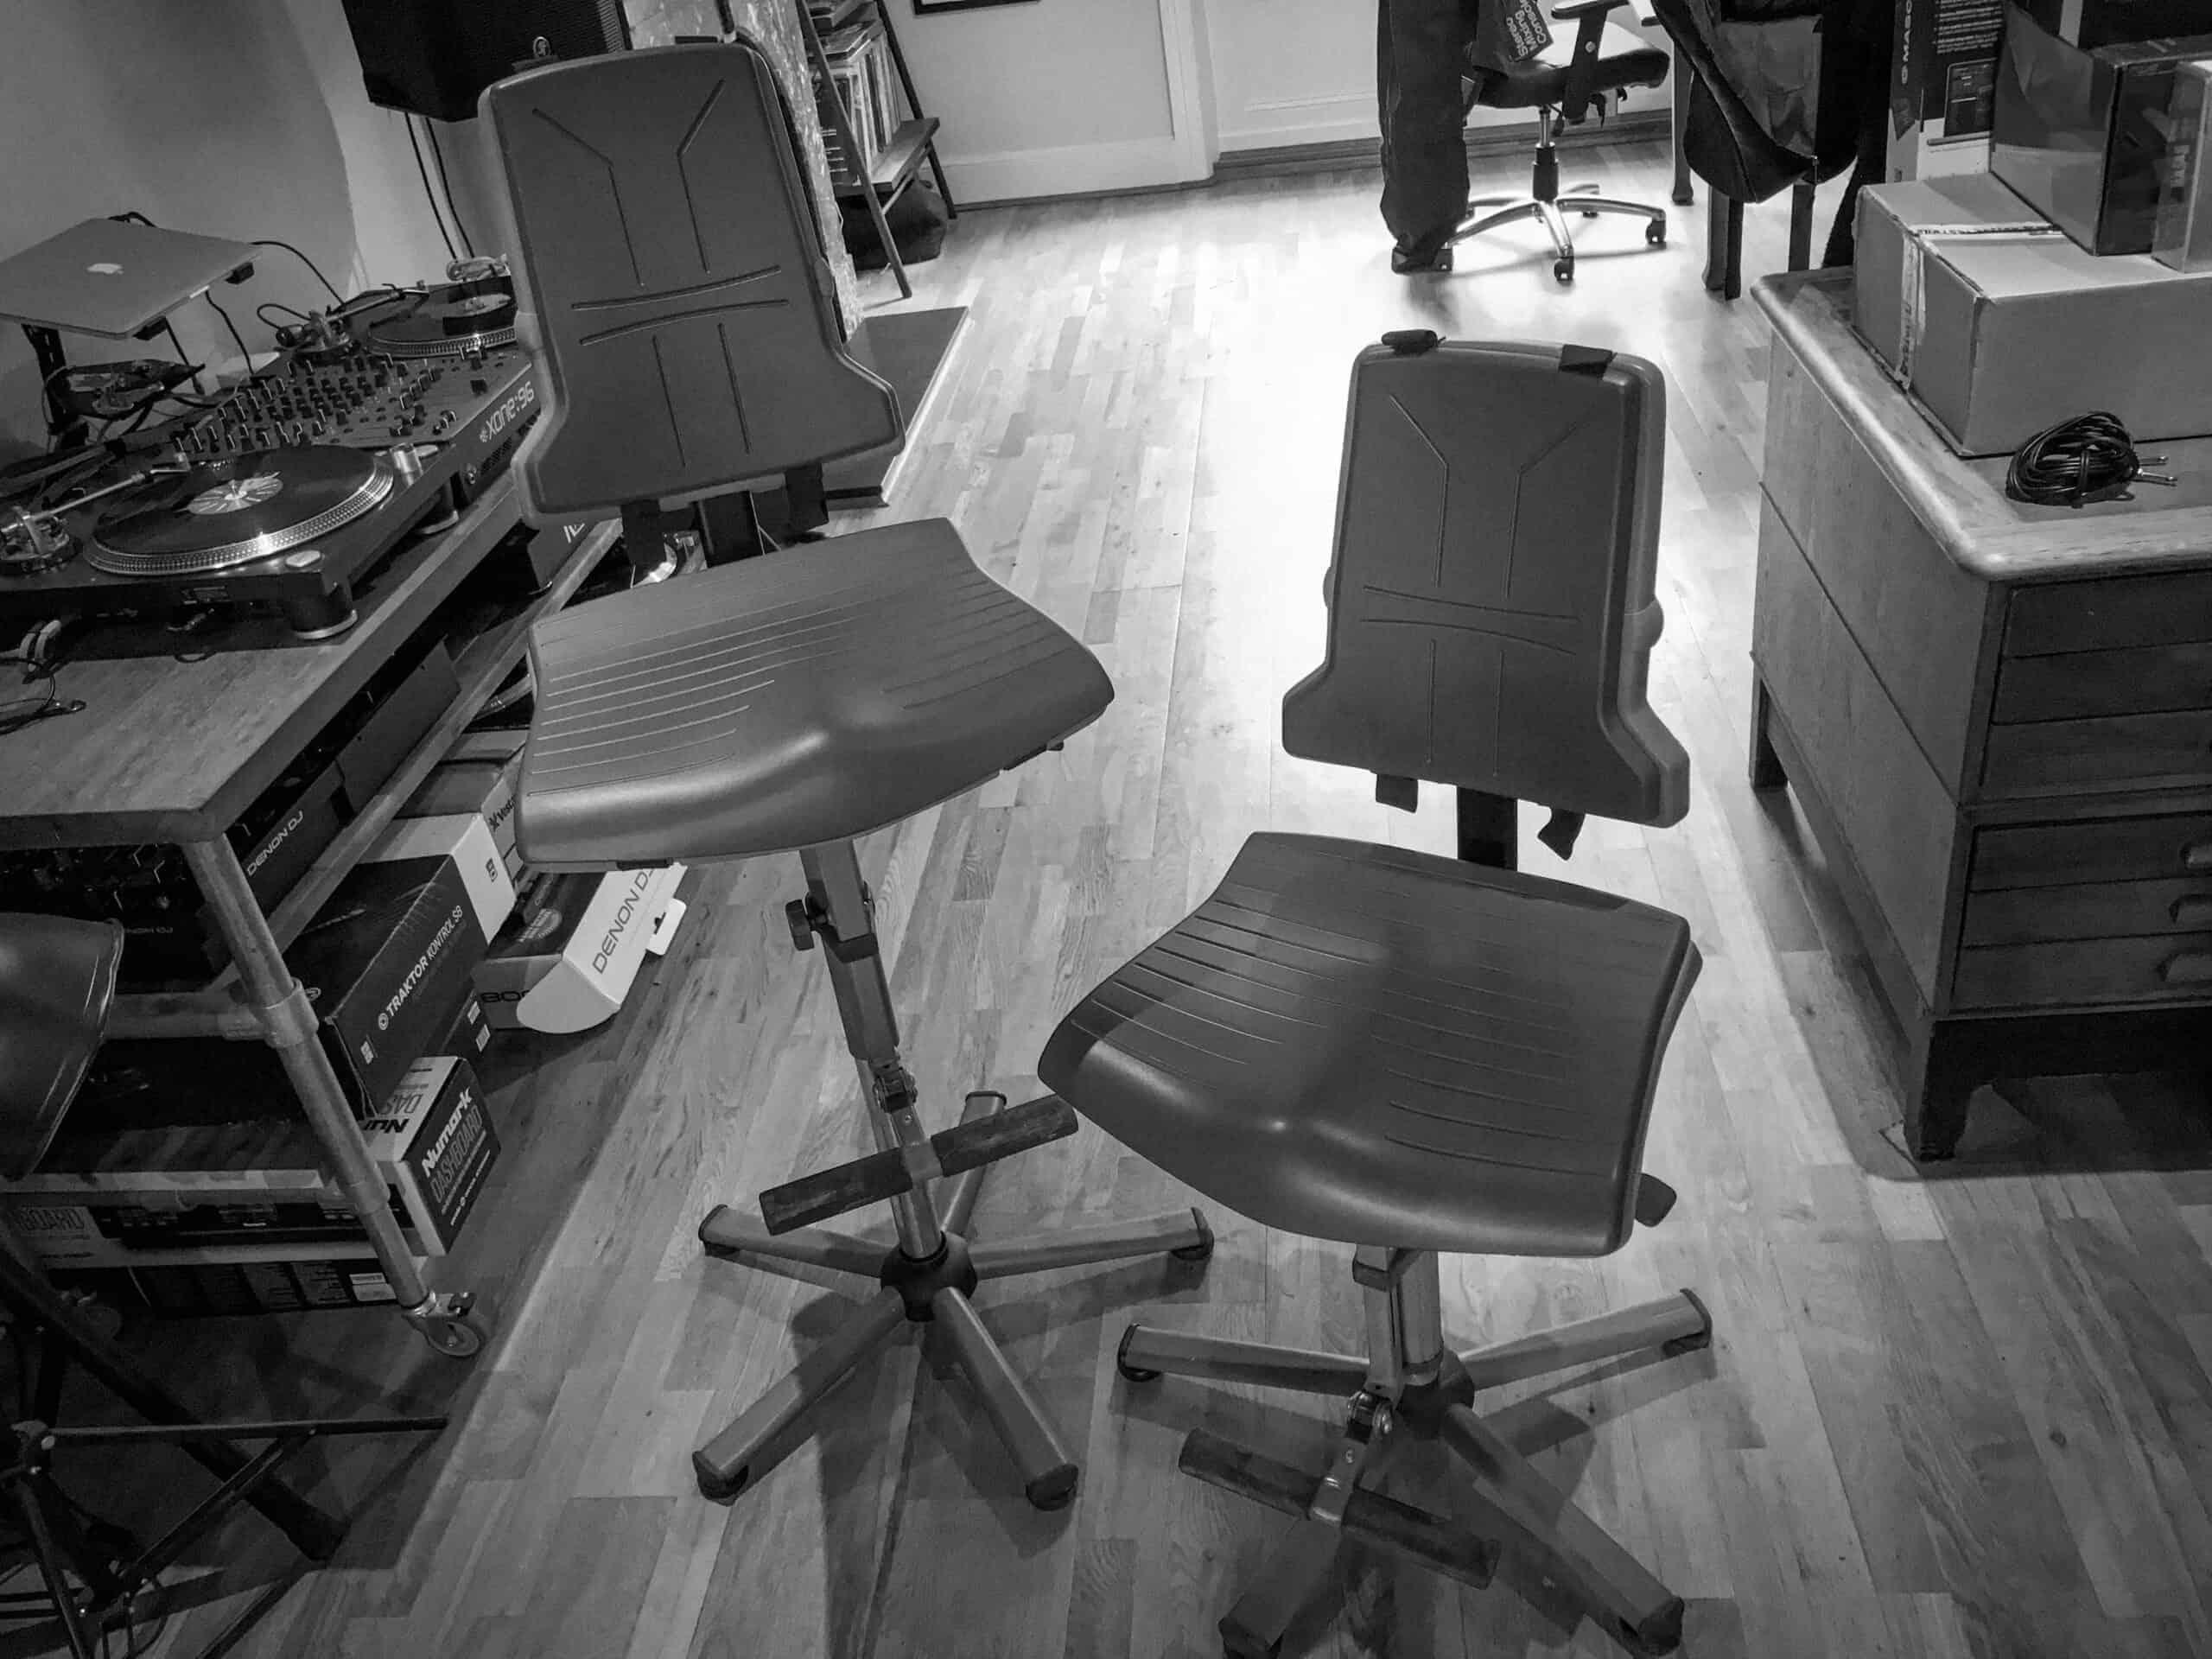 bimos sintec chairs